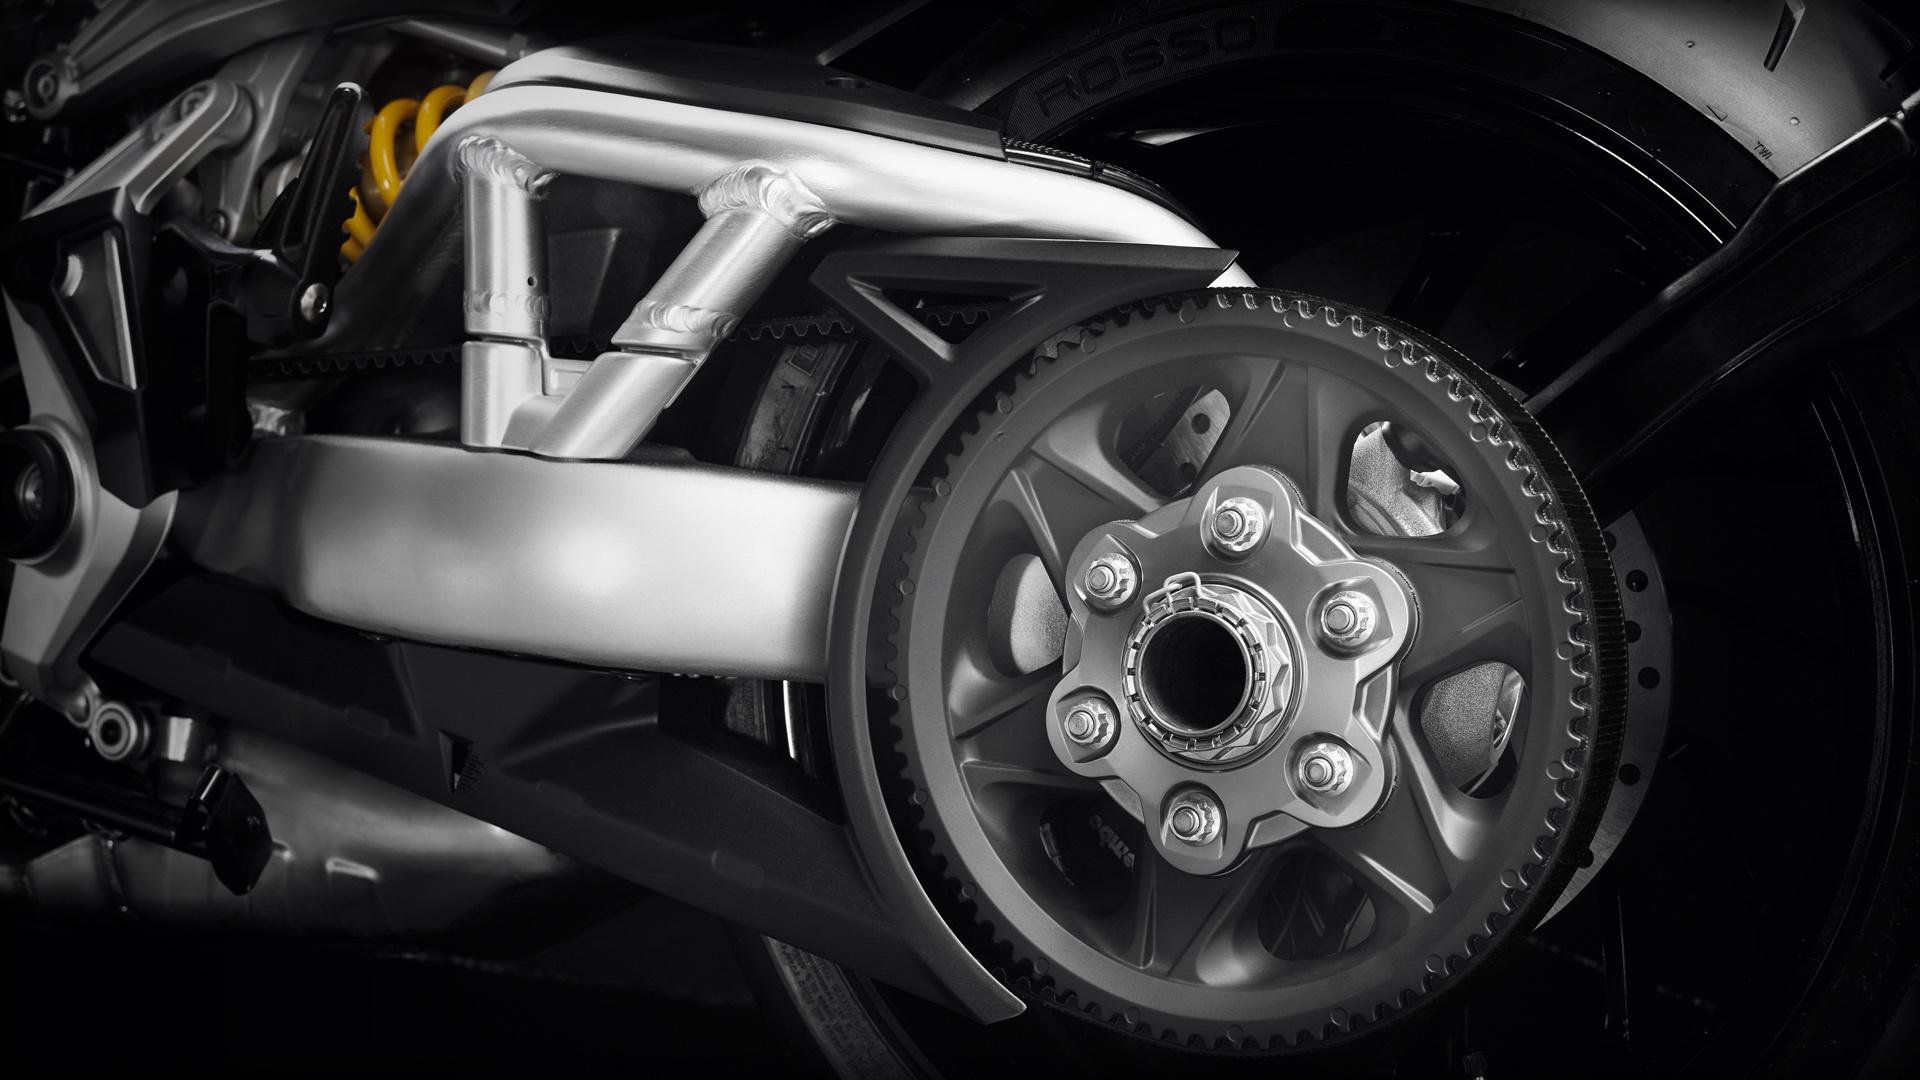 МОТОЦИКЛ DUCATI XDIAVEL  Артмото - купить квадроцикл в украине и харькове, мотоцикл, снегоход, скутер, мопед, электромобиль